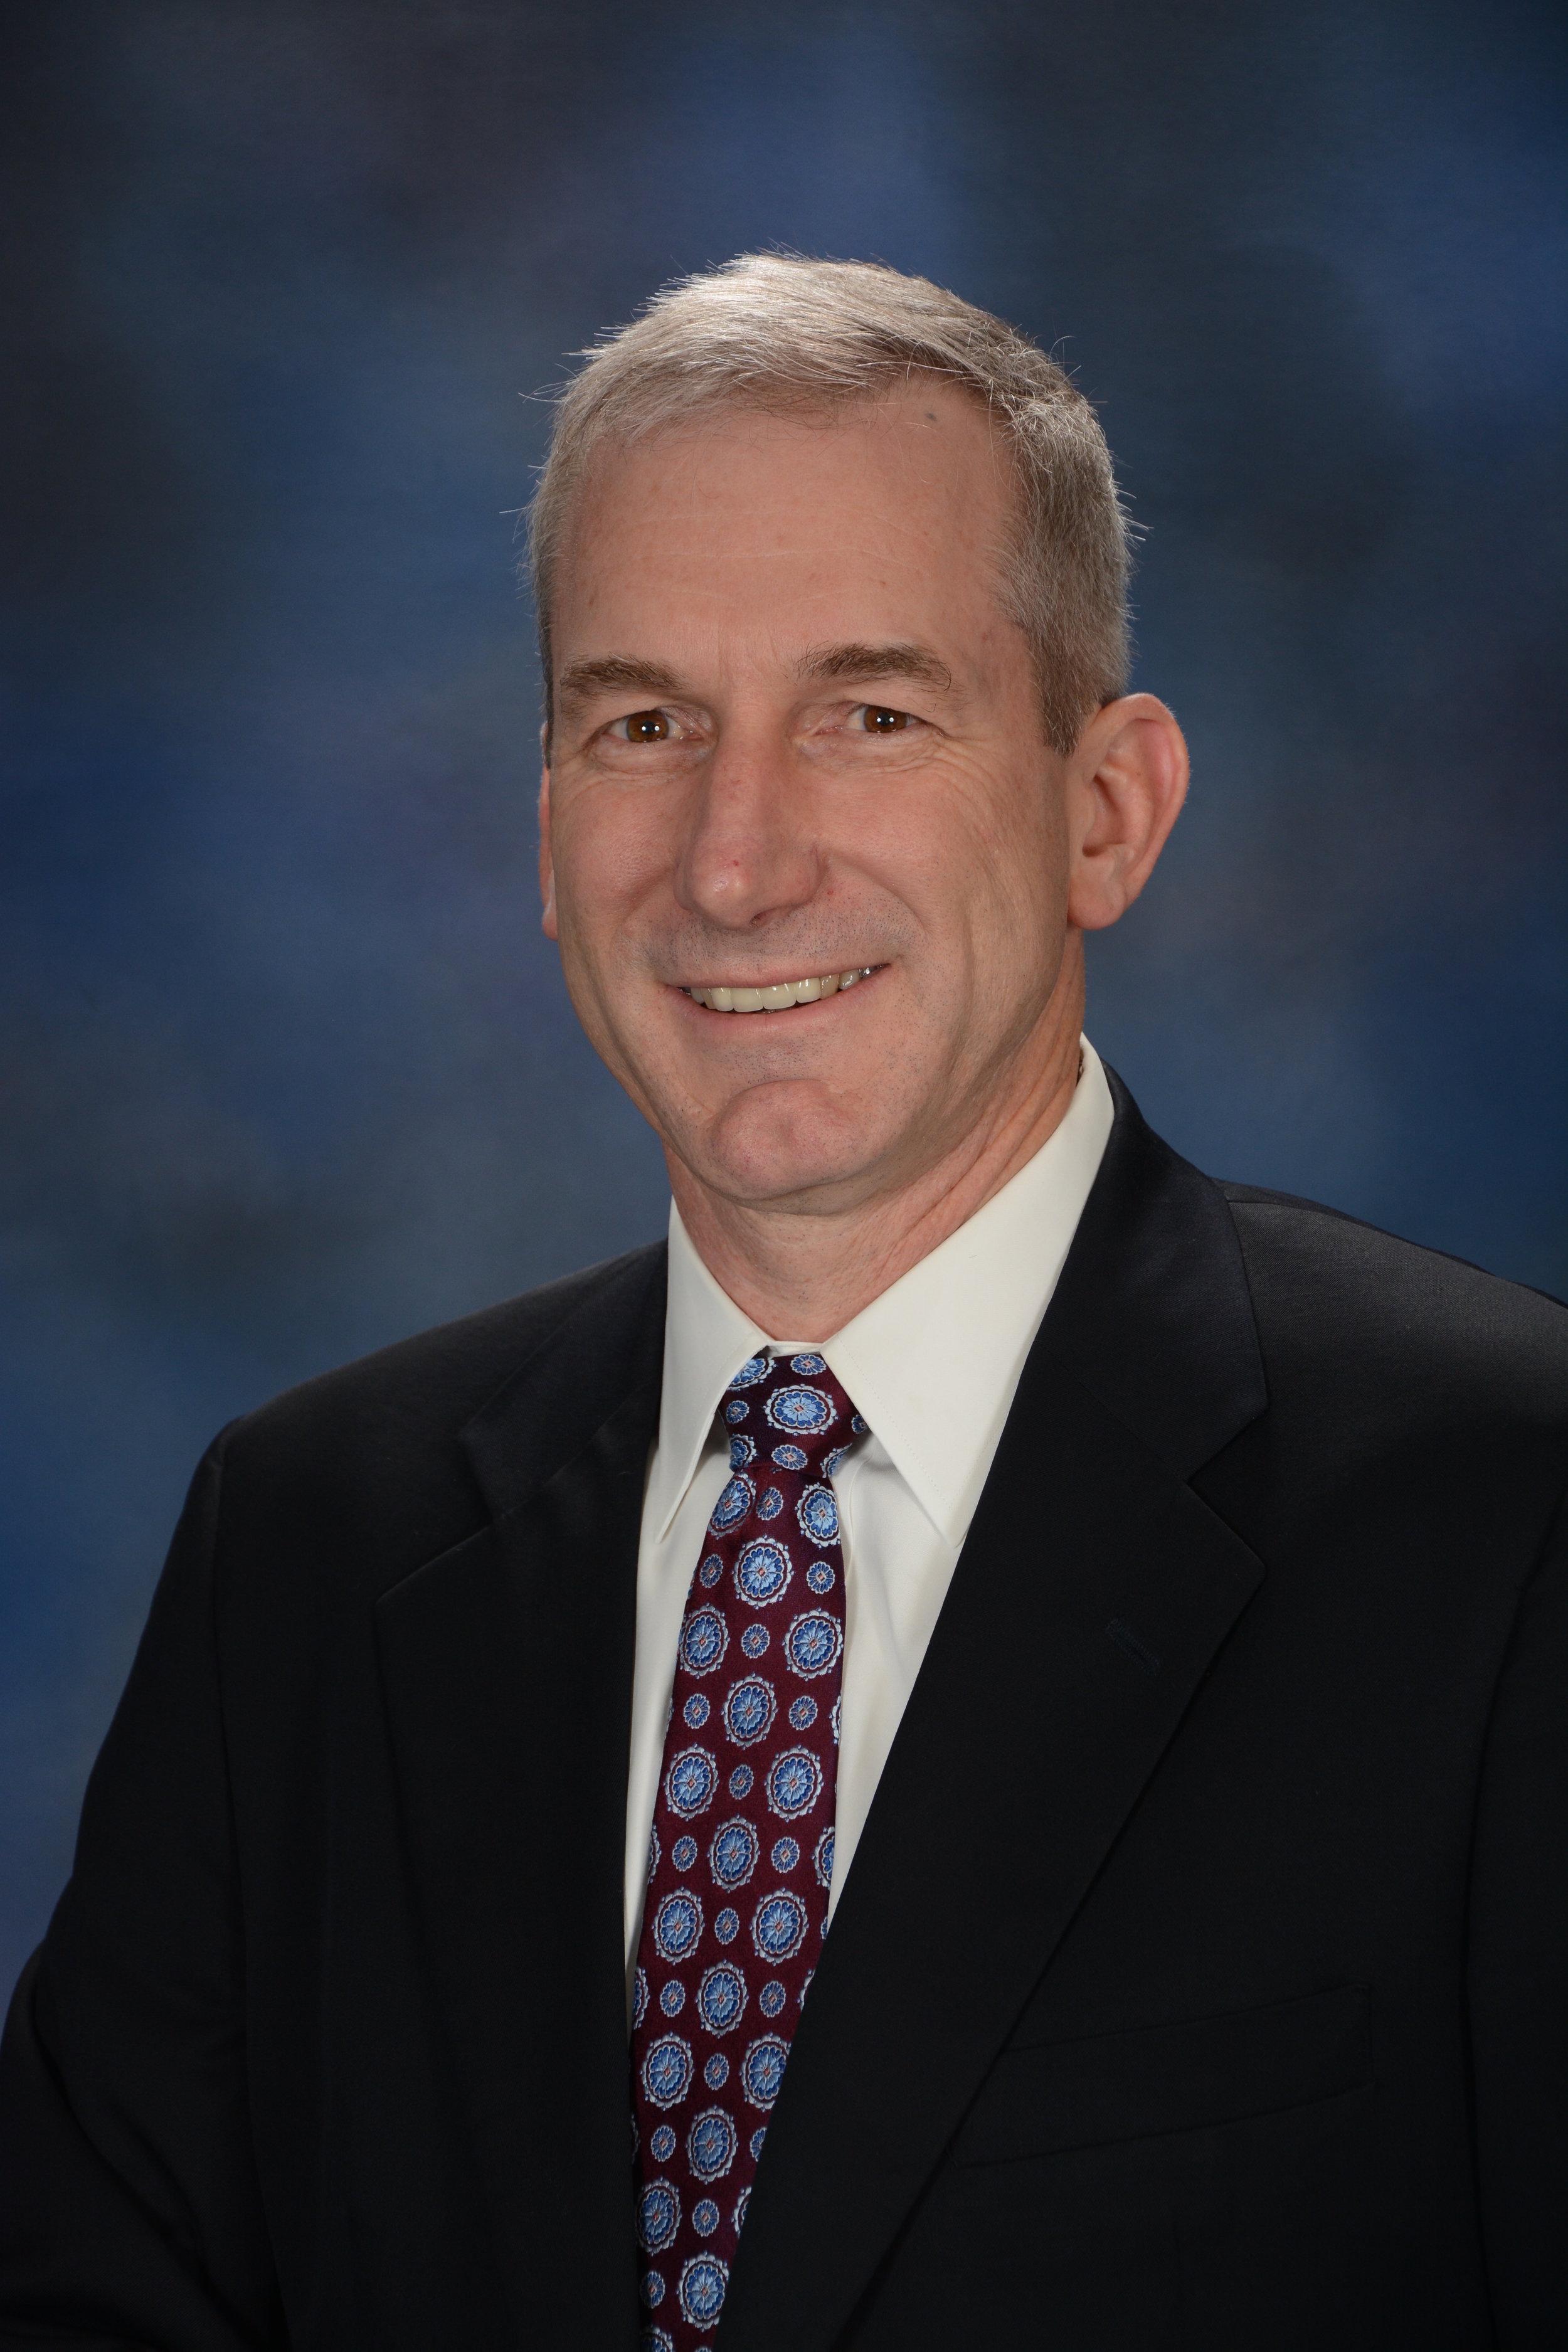 David Widmann,  President & CEO Konica Minolta Healthcare Americas